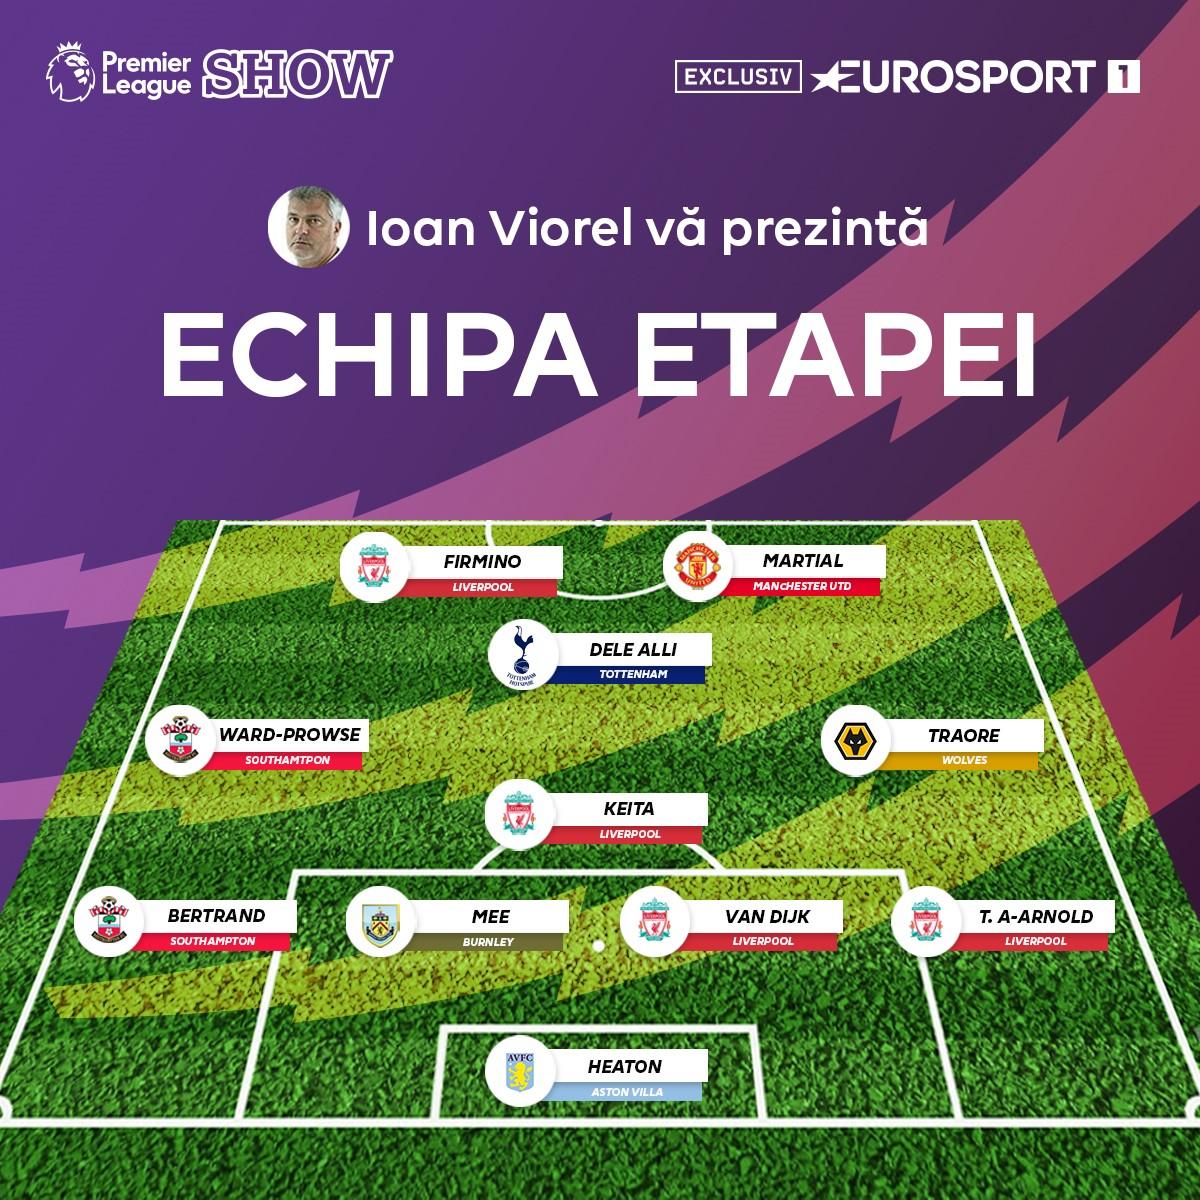 https://i.eurosport.com/2019/12/28/2743228.jpg